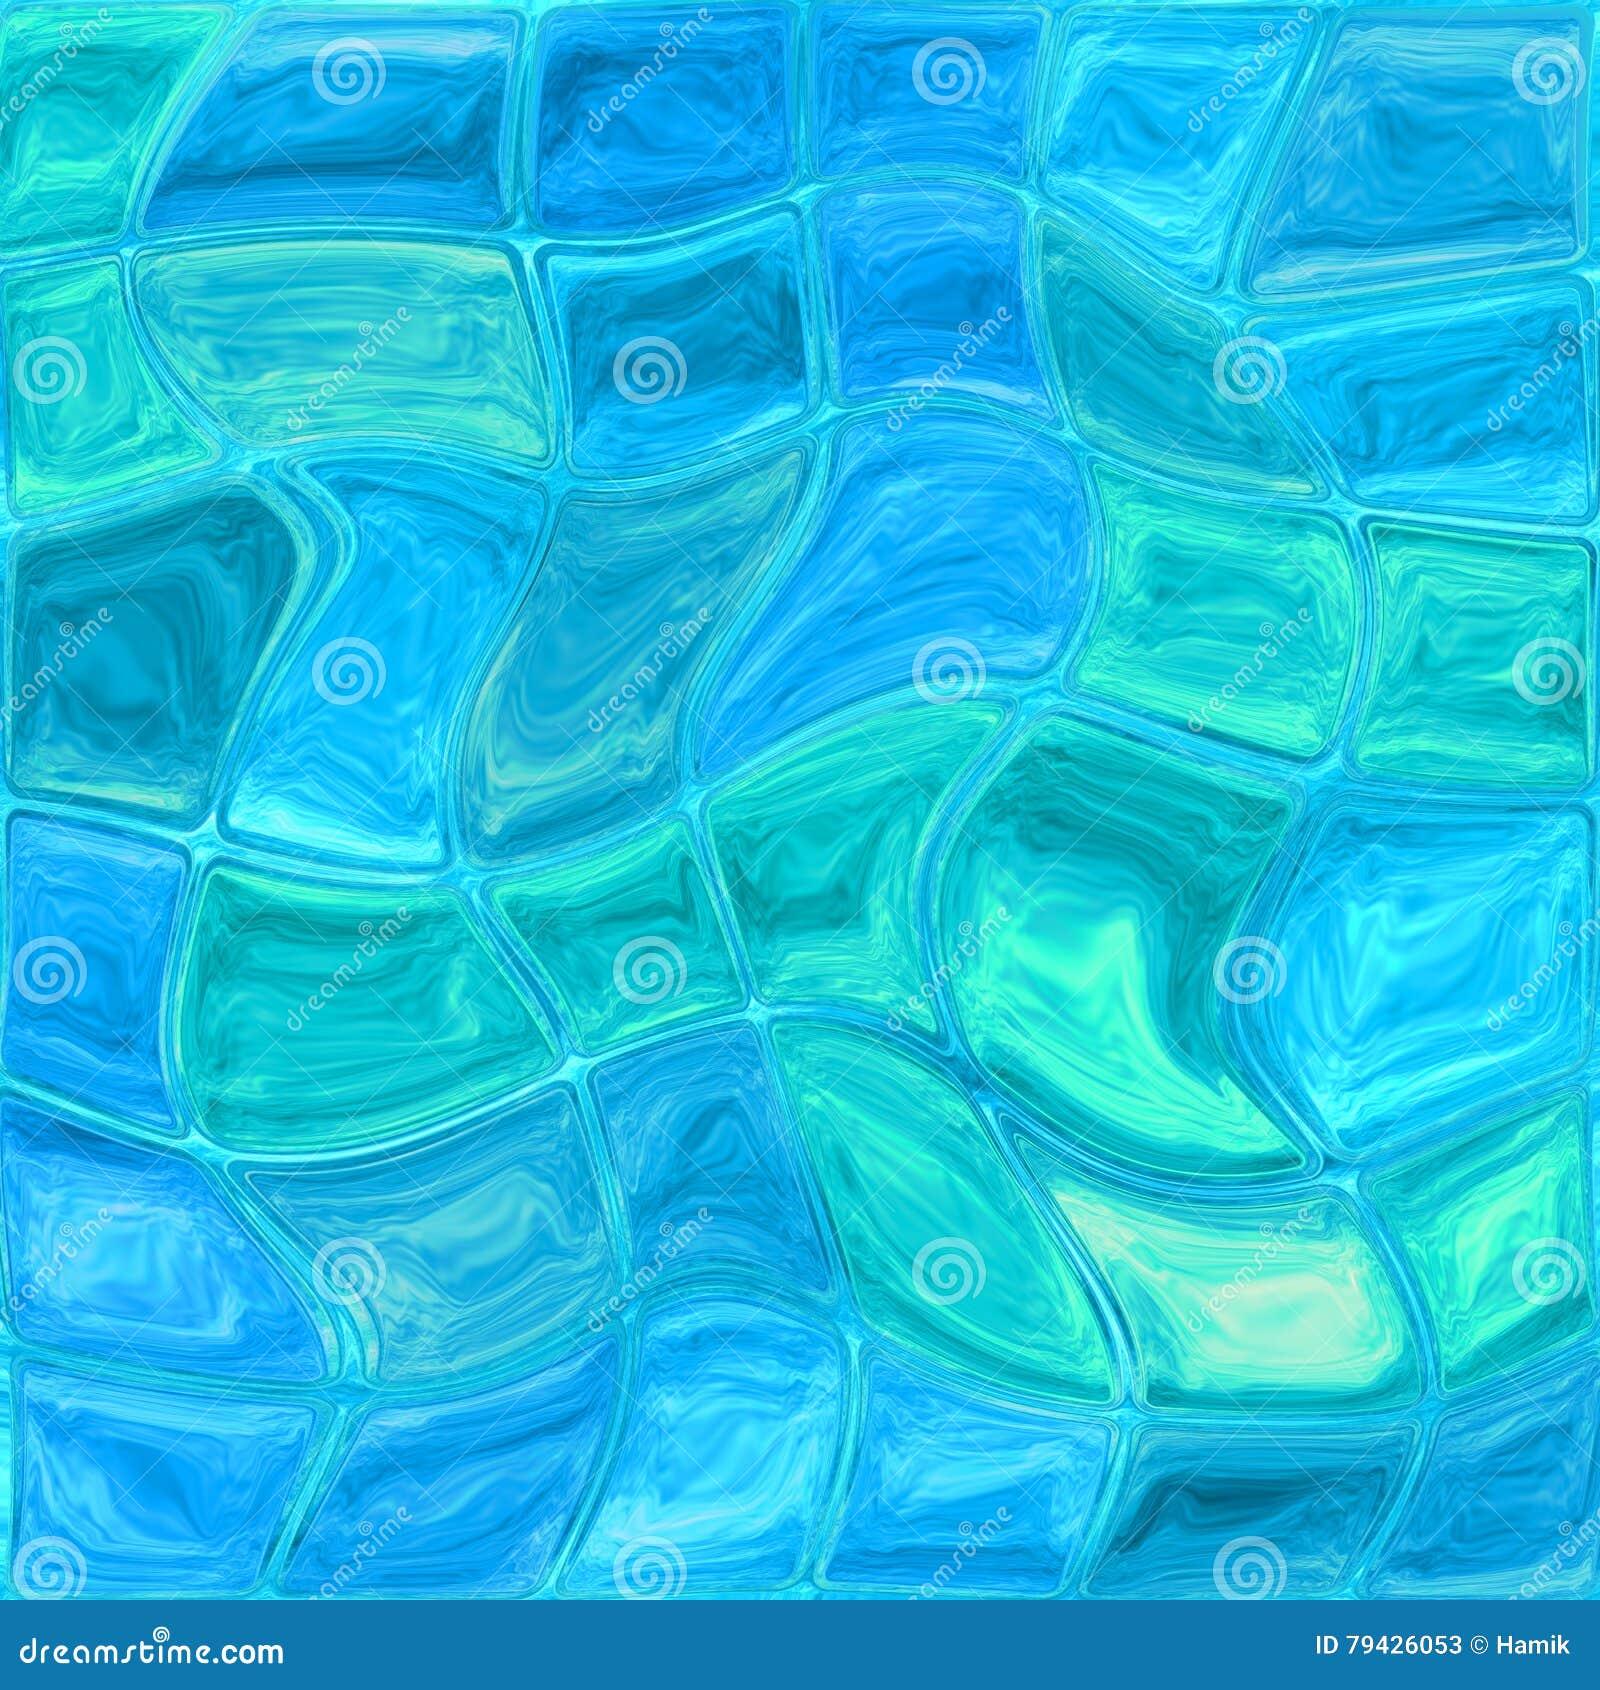 Blue Glass Tiles Stock Photo Image 79426053